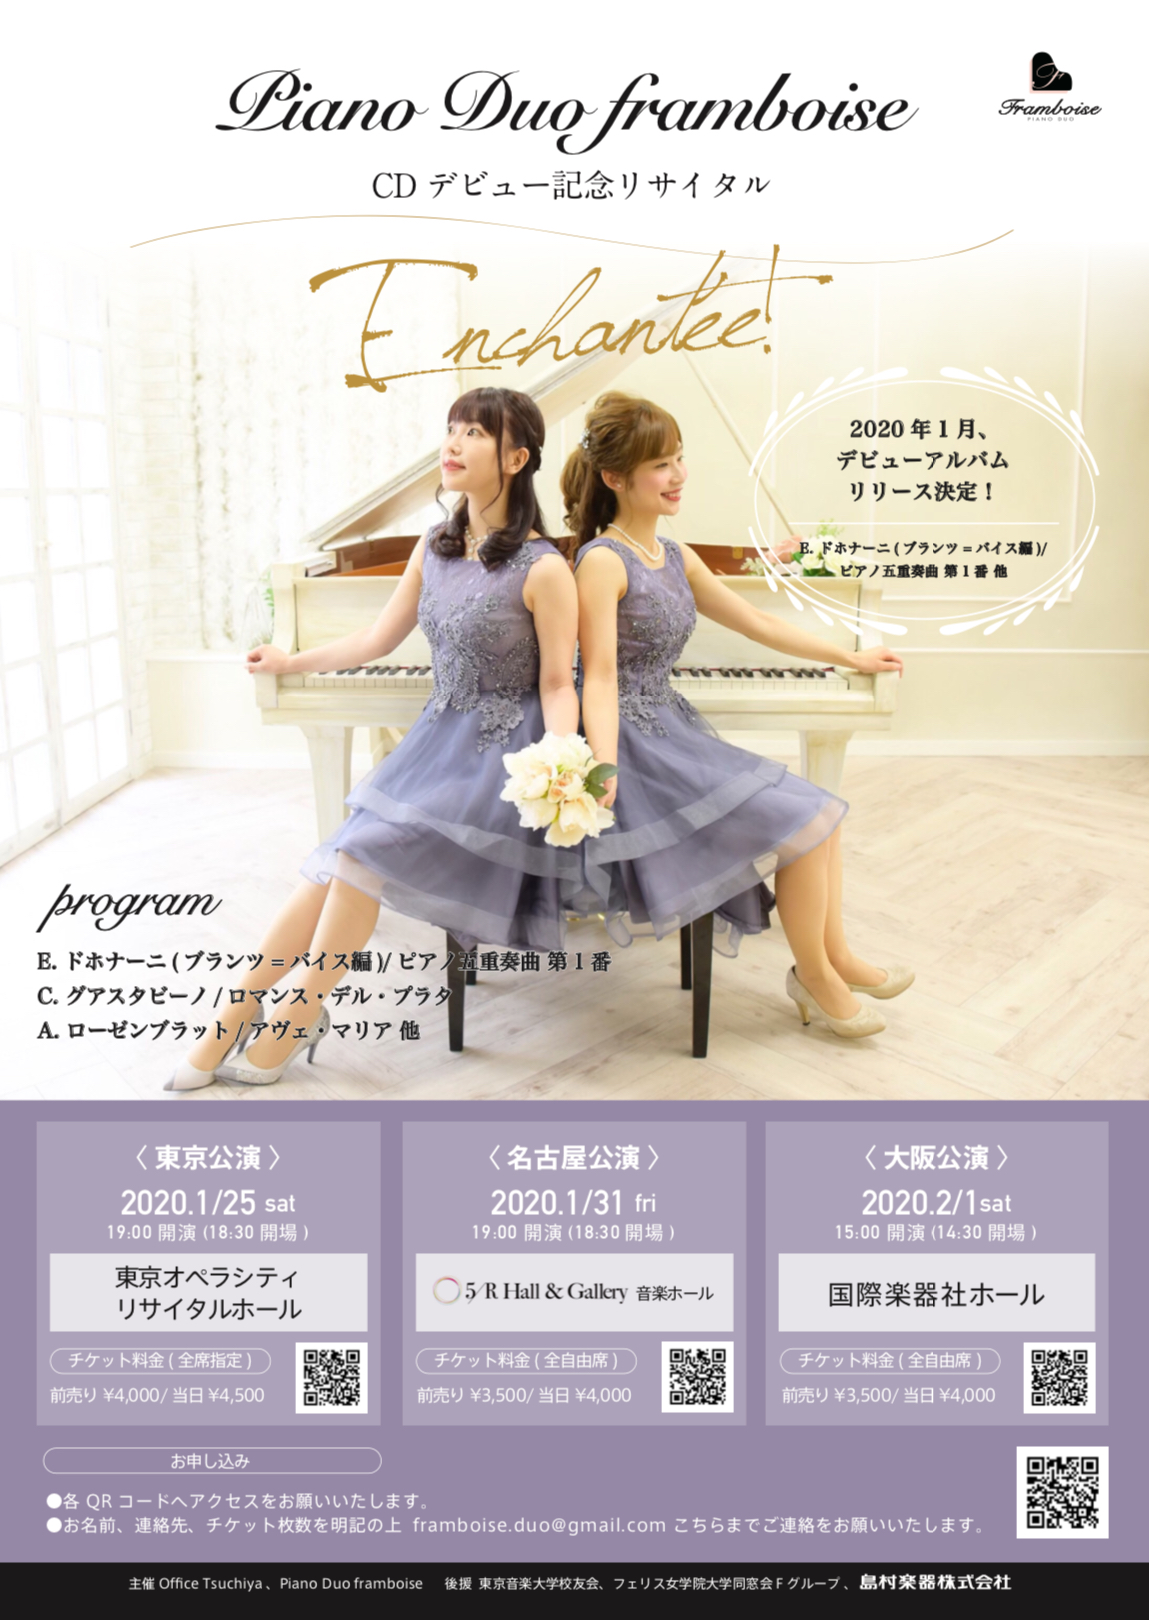 Piano Duo framboise CDデビュー記念リサイタル Enchantée!